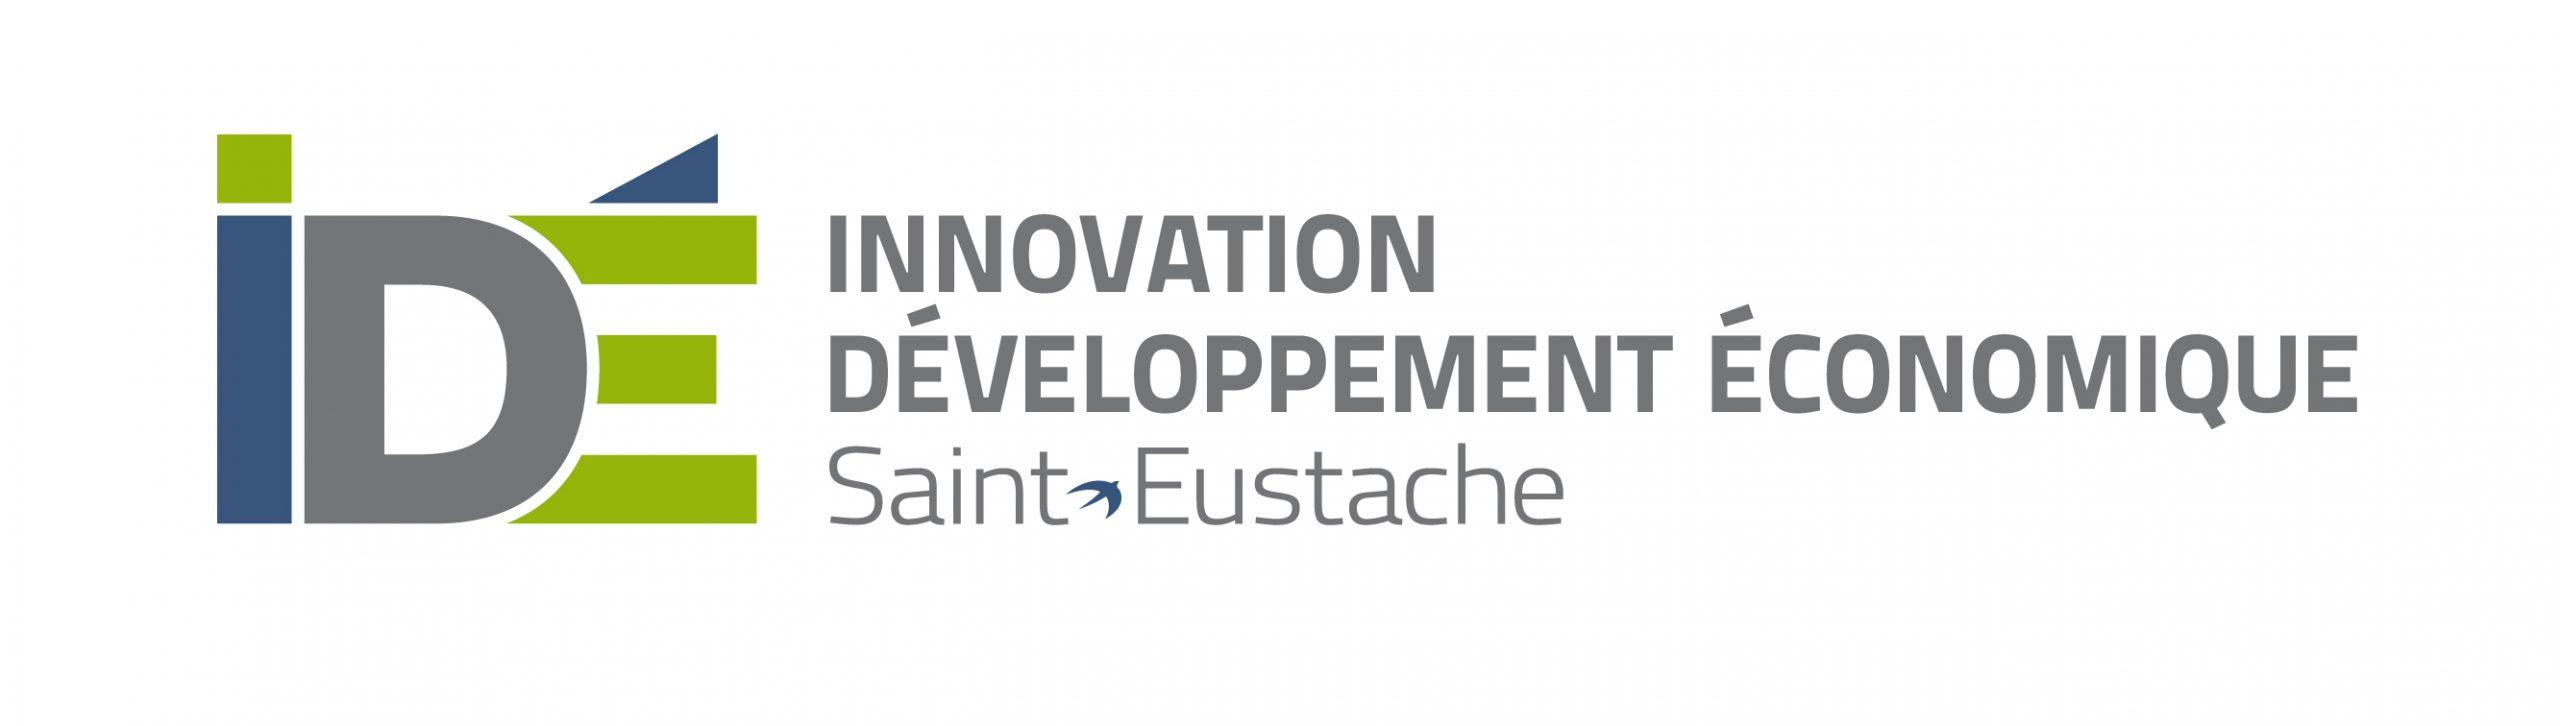 IDE Saint-Eustache